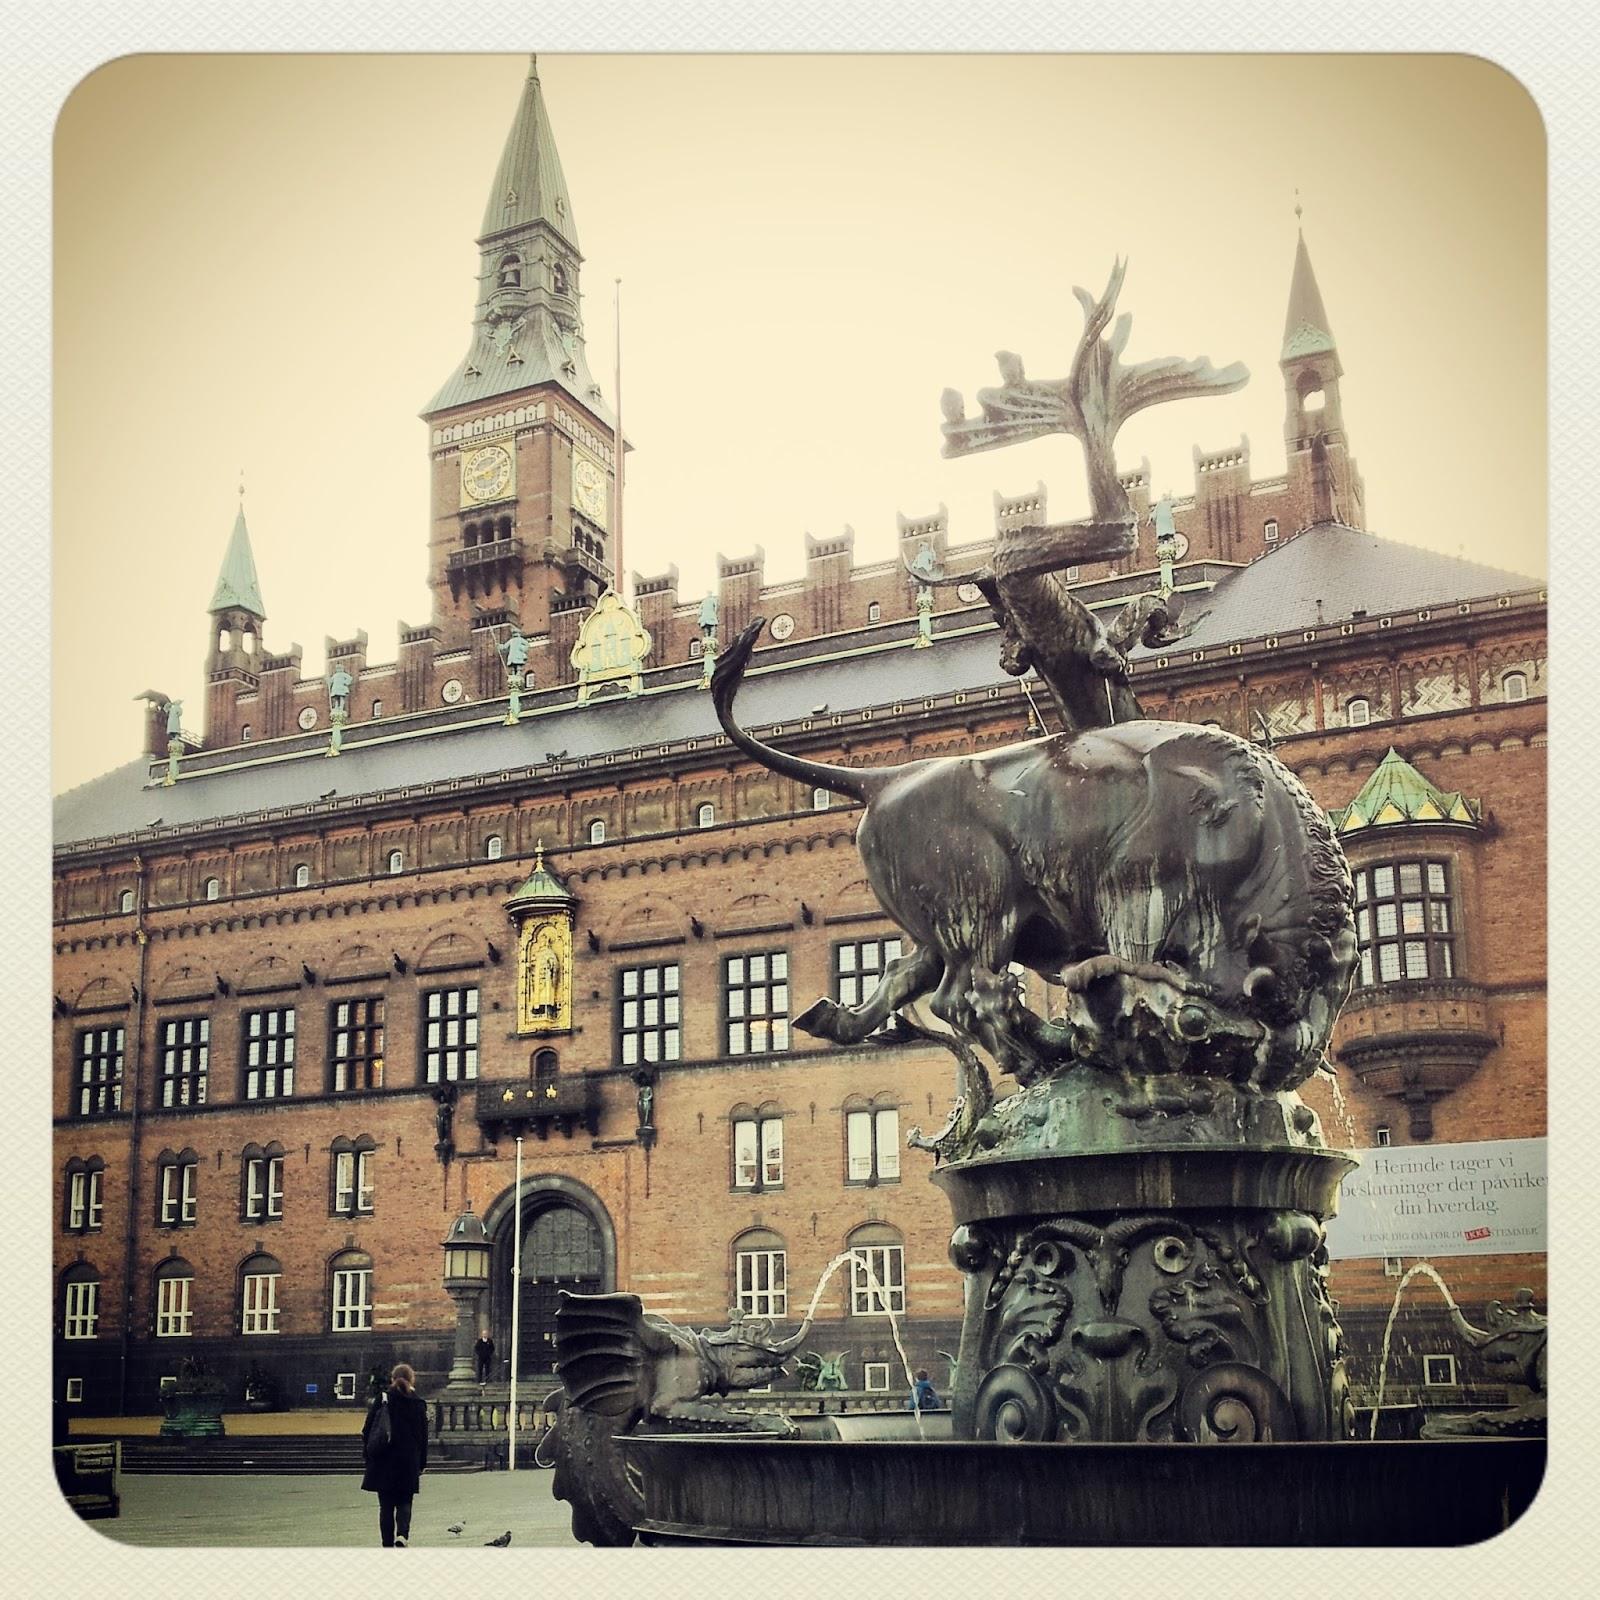 Copenaghen Rådhus